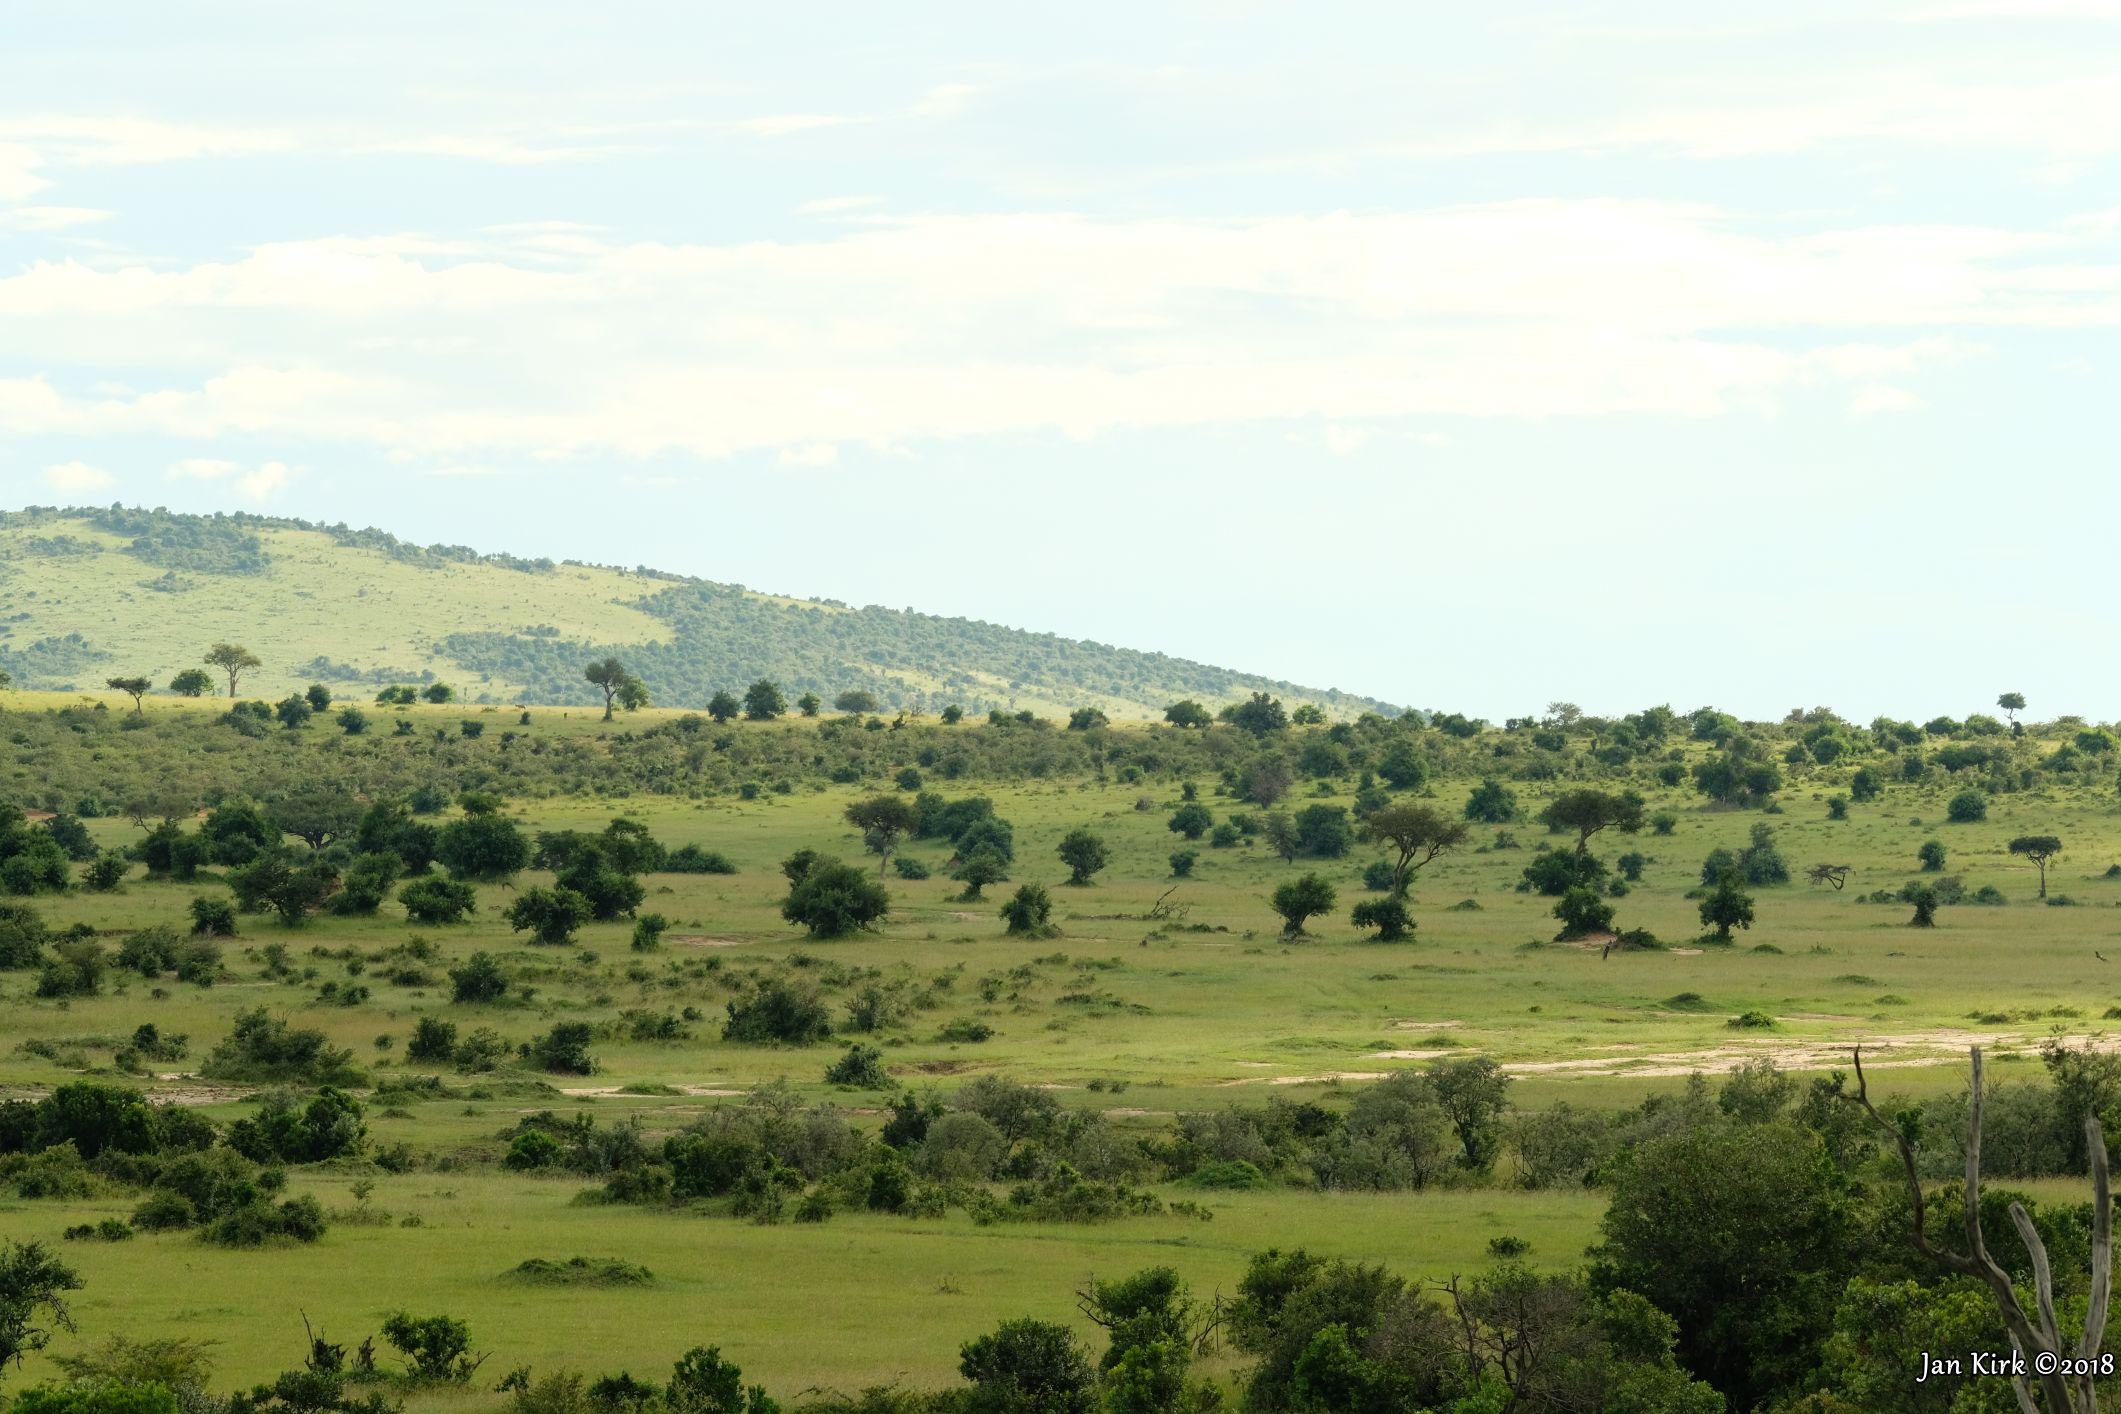 Landscapes of Masai Mara